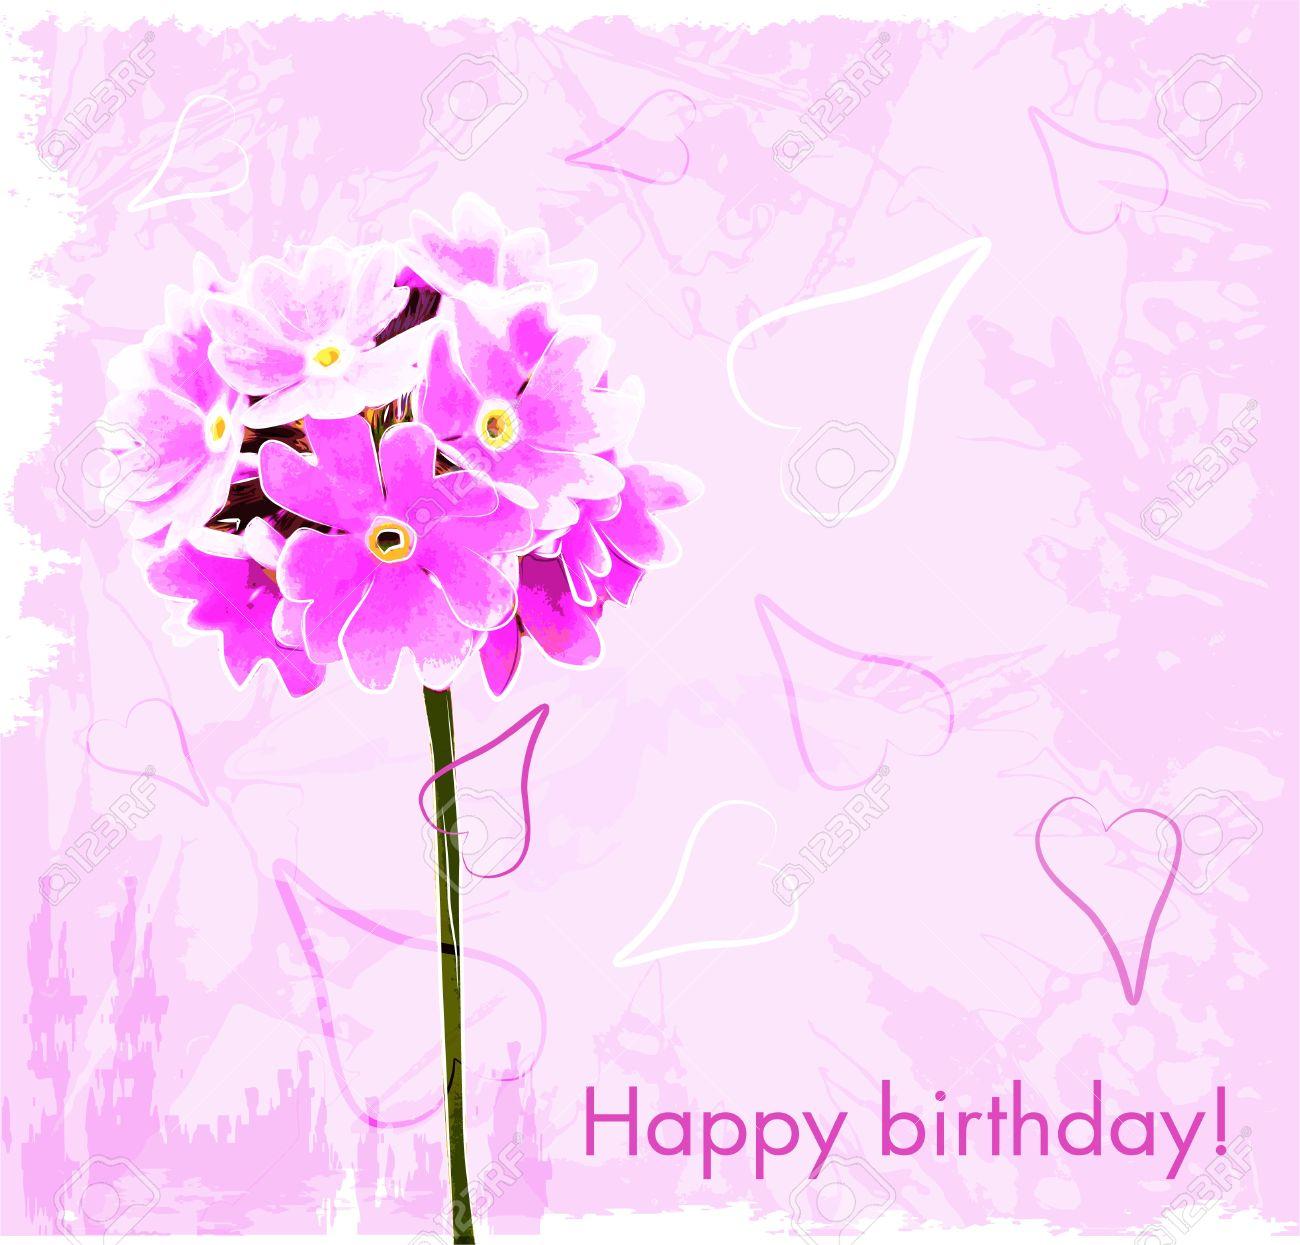 Happy birthday flowers cards – 123 Happy Birthday Cards